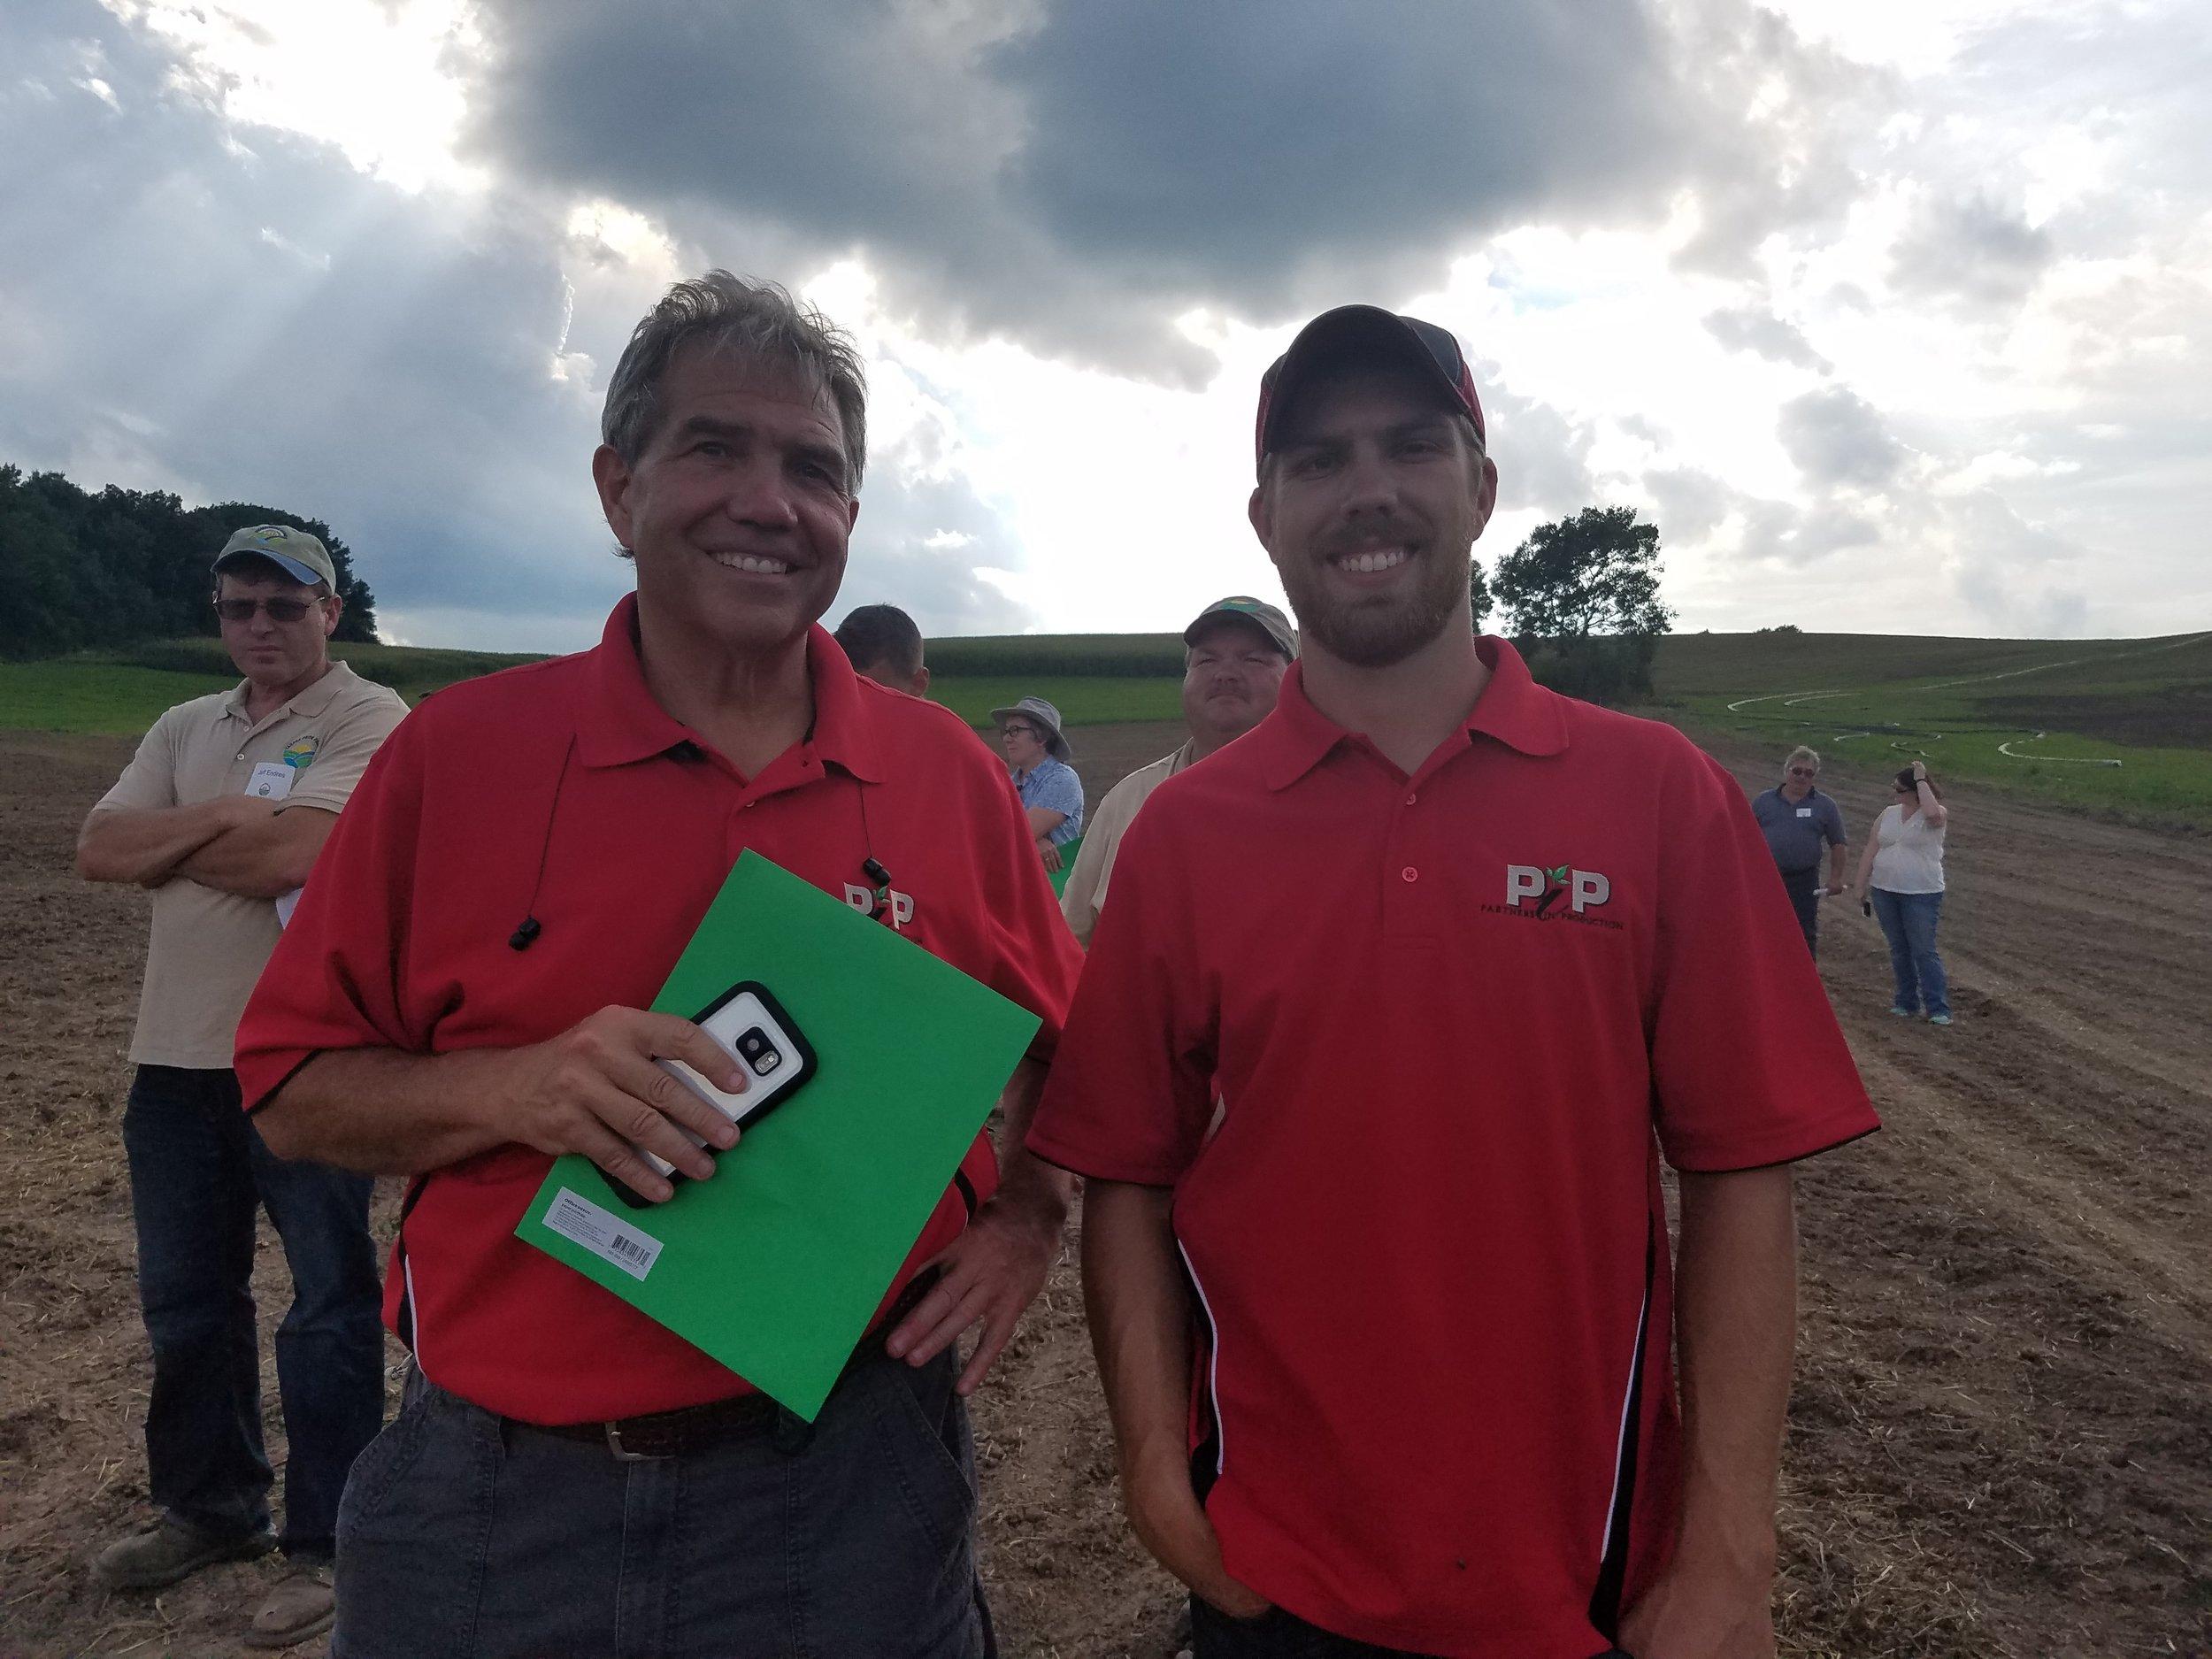 Jack Kaltenberg and his son Garret Kaltenberg attending a field day in 2016